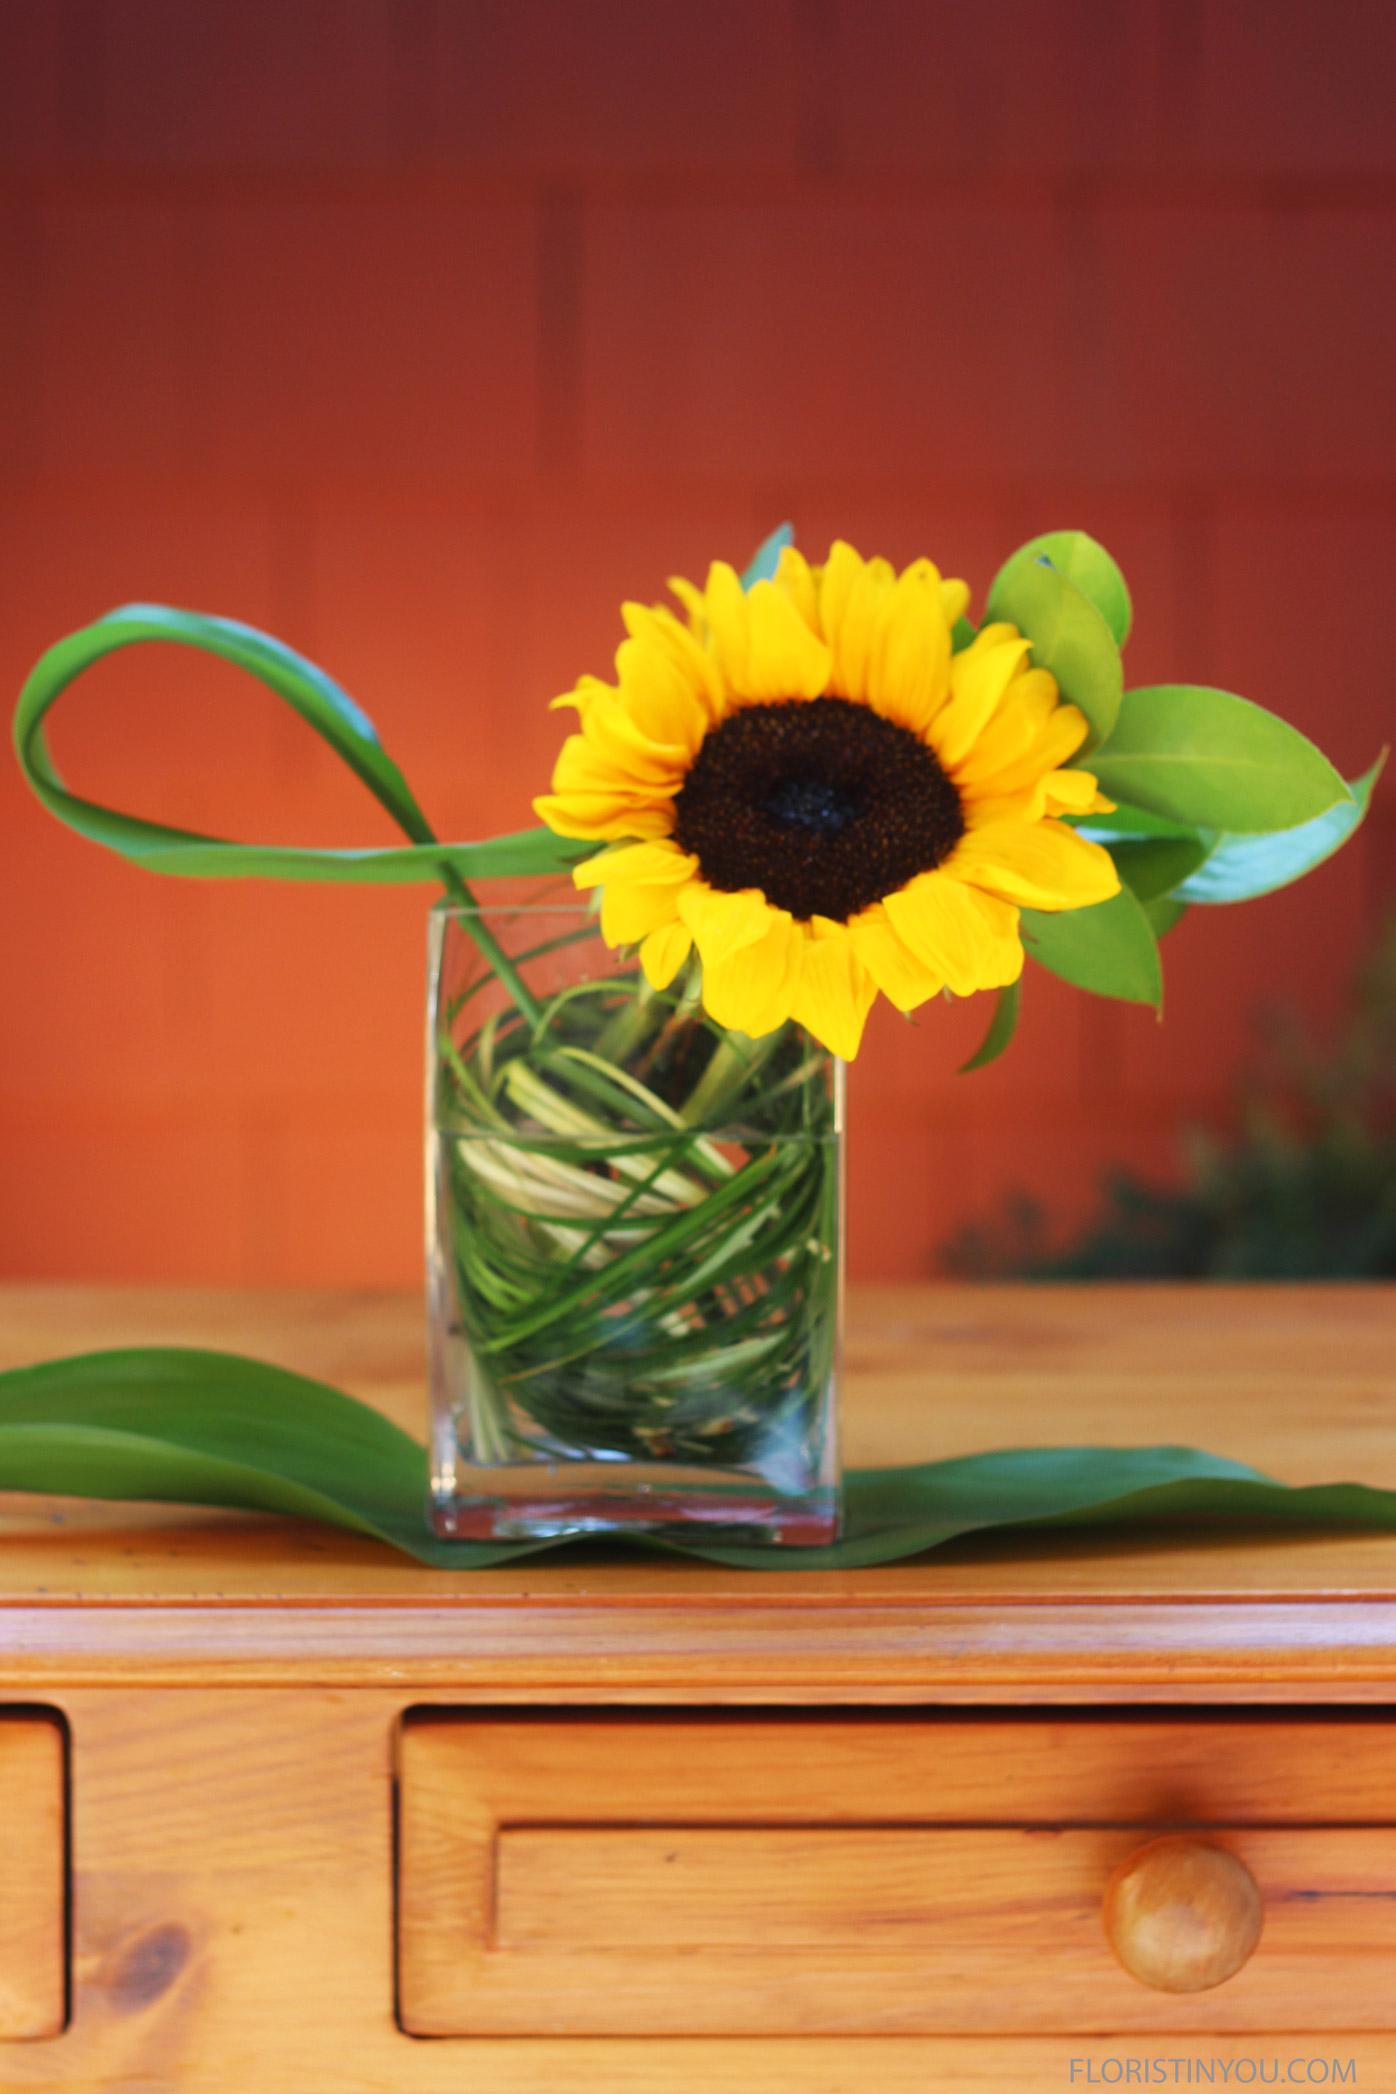 "Sunflowers in a Rectangular Vase                     Normal   0           false   false   false     EN-US   JA   X-NONE                                                                                                                                                                                                                                                                                                                                                                              /* Style Definitions */ table.MsoNormalTable {mso-style-name:""Table Normal""; mso-tstyle-rowband-size:0; mso-tstyle-colband-size:0; mso-style-noshow:yes; mso-style-priority:99; mso-style-parent:""""; mso-padding-alt:0in 5.4pt 0in 5.4pt; mso-para-margin:0in; mso-para-margin-bottom:.0001pt; mso-pagination:widow-orphan; font-size:12.0pt; font-family:Cambria; mso-ascii-font-family:Cambria; mso-ascii-theme-font:minor-latin; mso-hansi-font-family:Cambria; mso-hansi-theme-font:minor-latin;}"